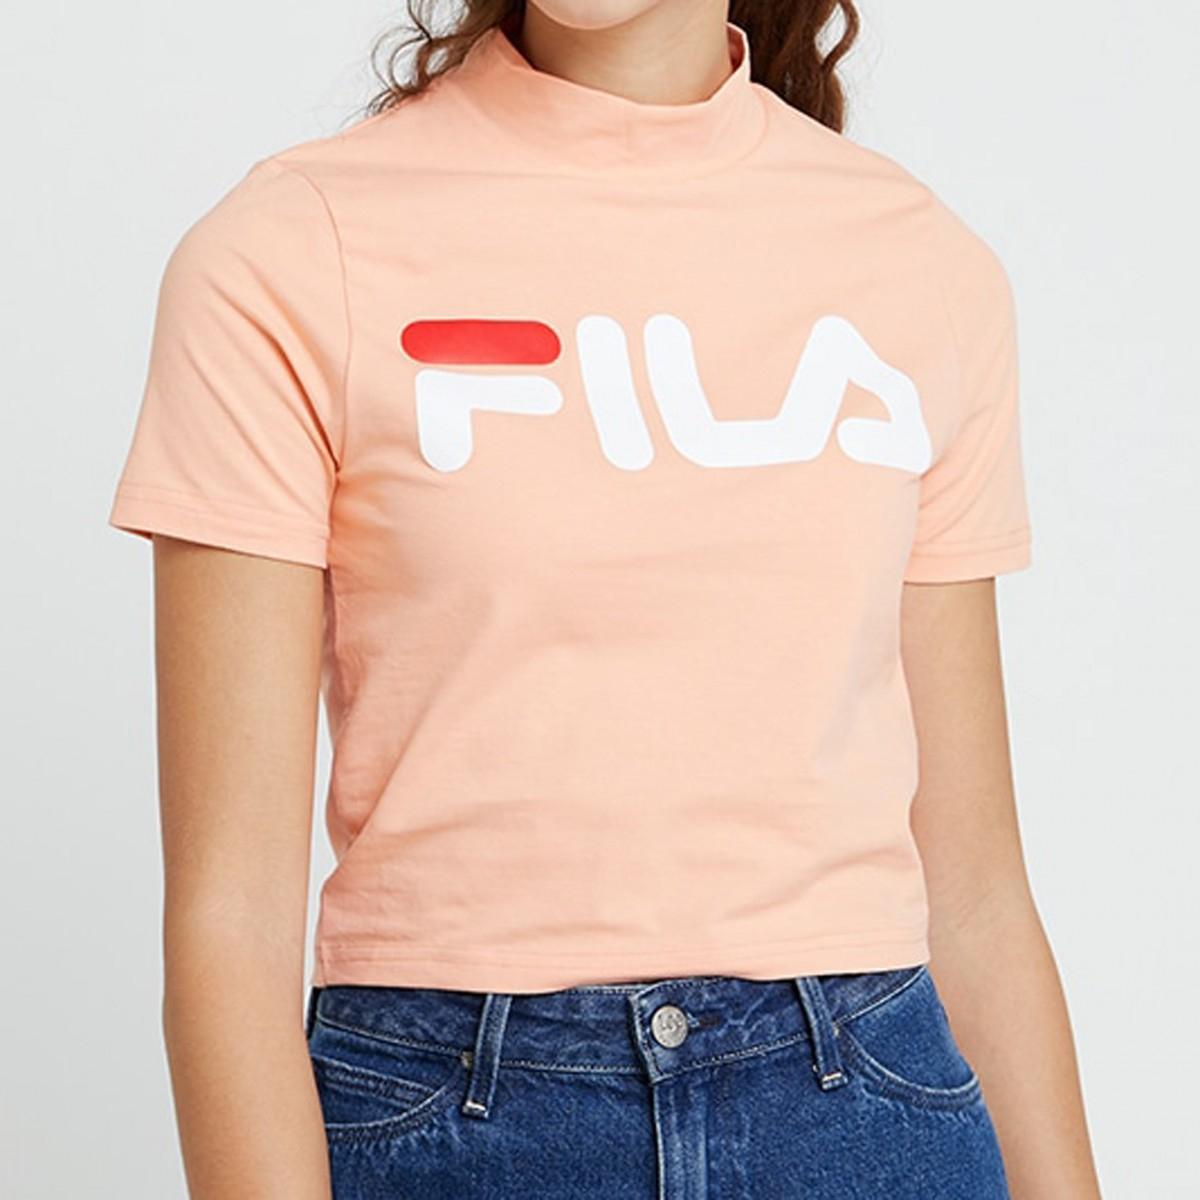 Fila 'Every' Turtle T-Shirt für Damen in Rosa (Gr. XS-L)